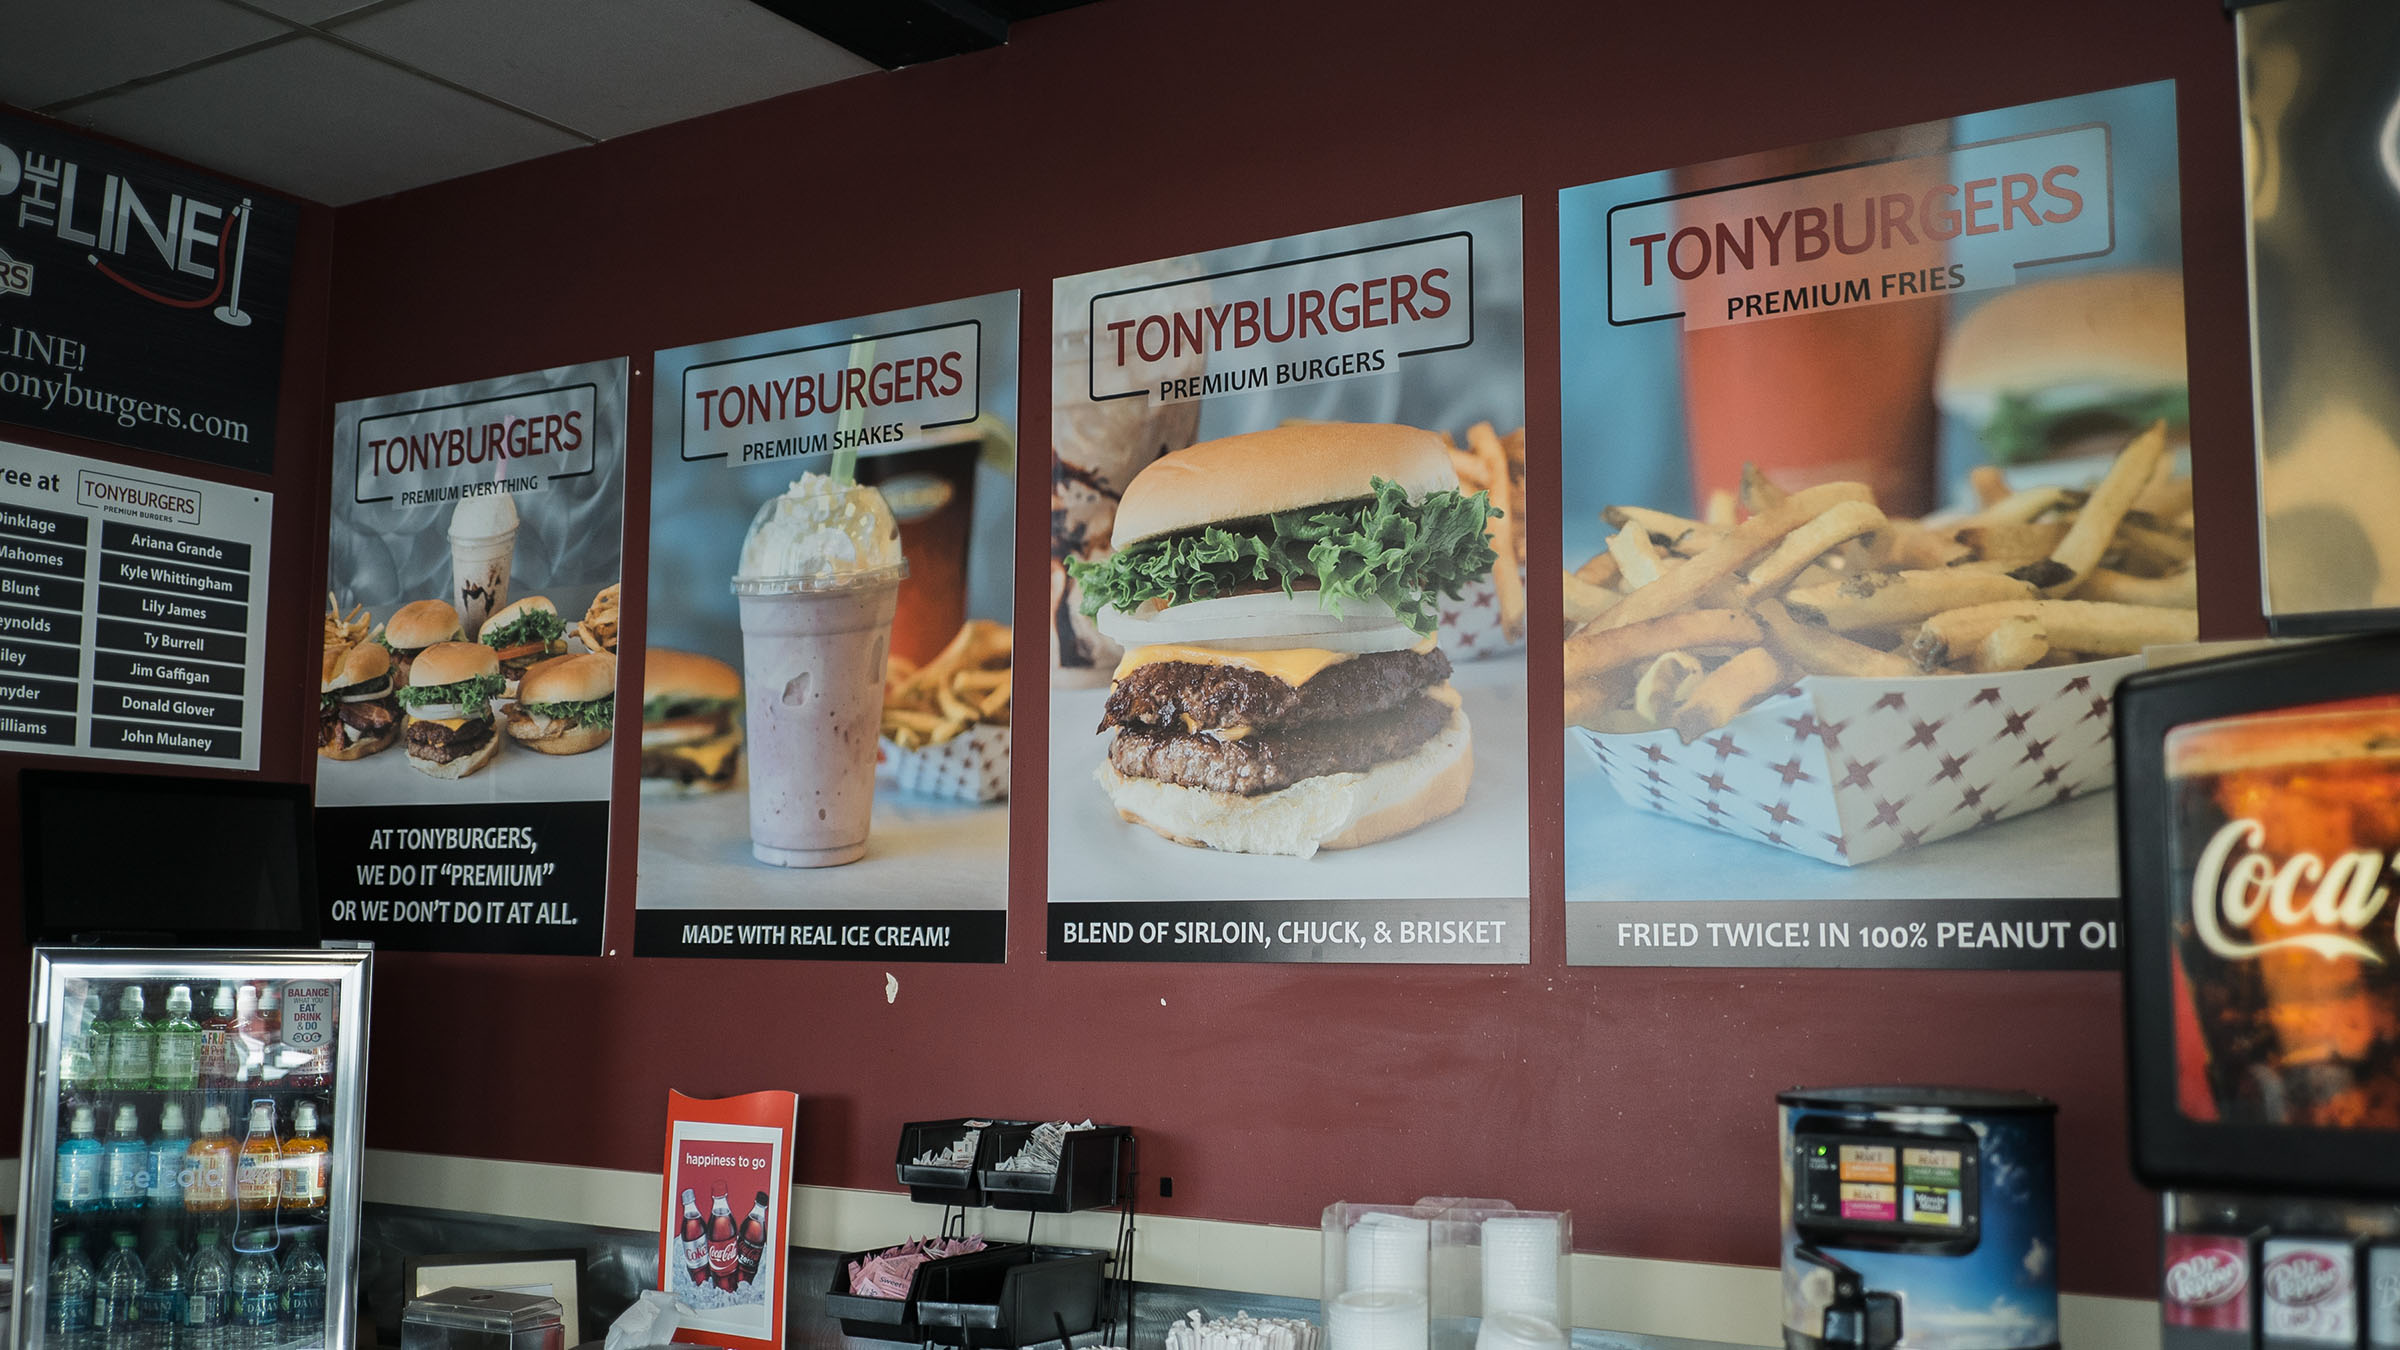 tonyburgers-big-american-story-01389.jpg